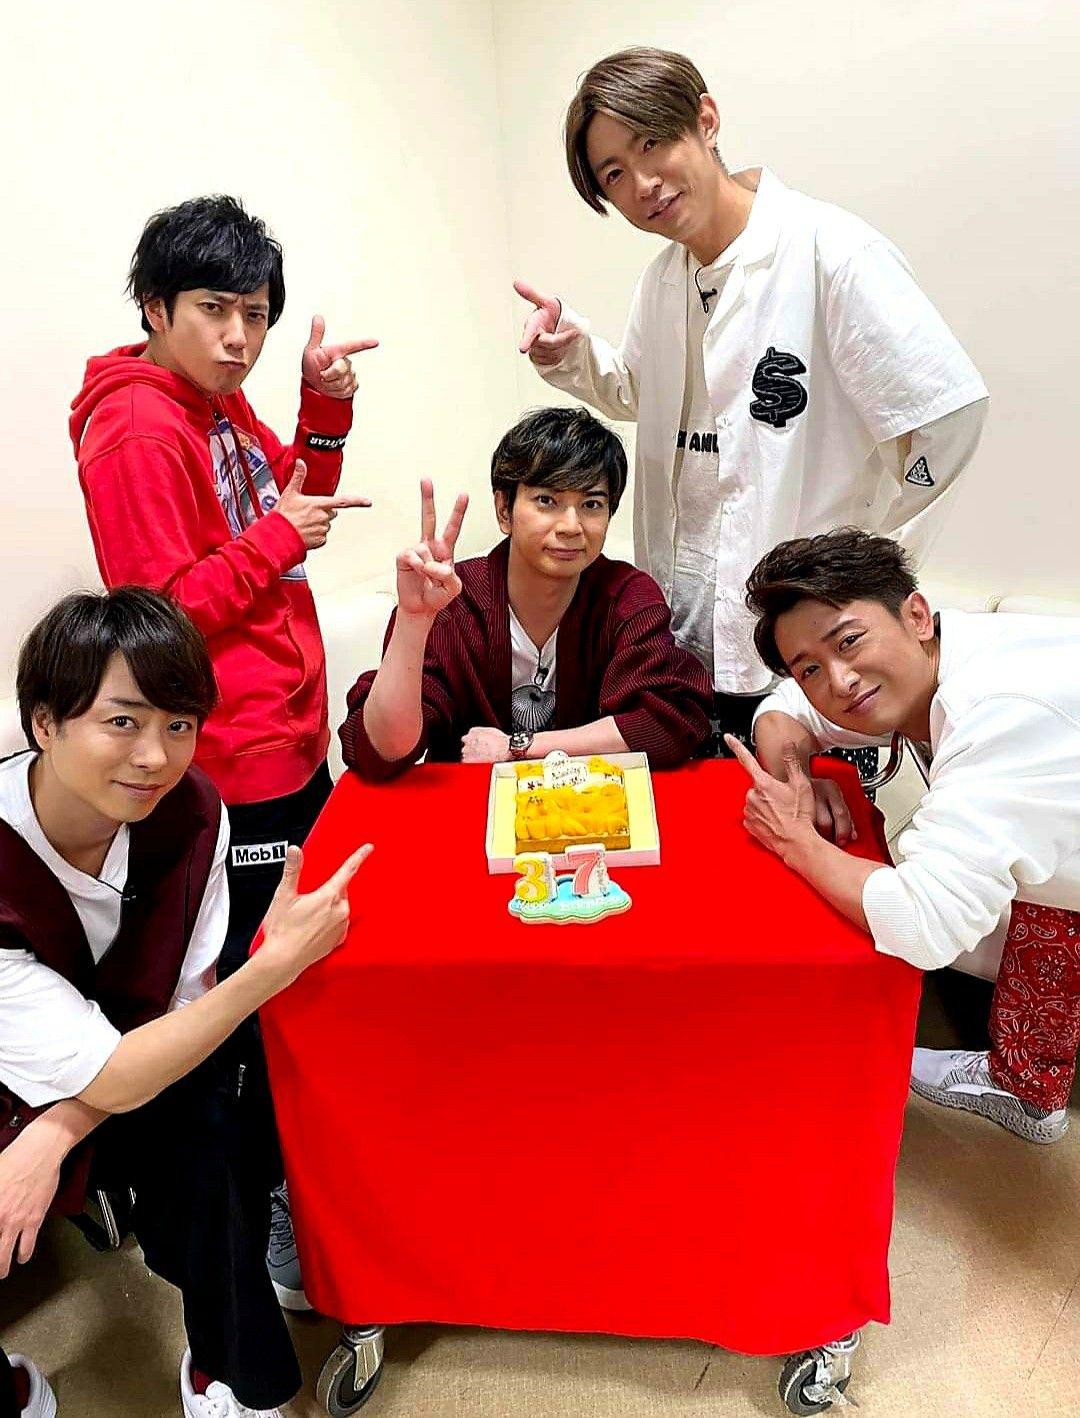 arashi celebrating mj s 37th birthday 2020 嵐5人 love 嵐 嵐 コンサート